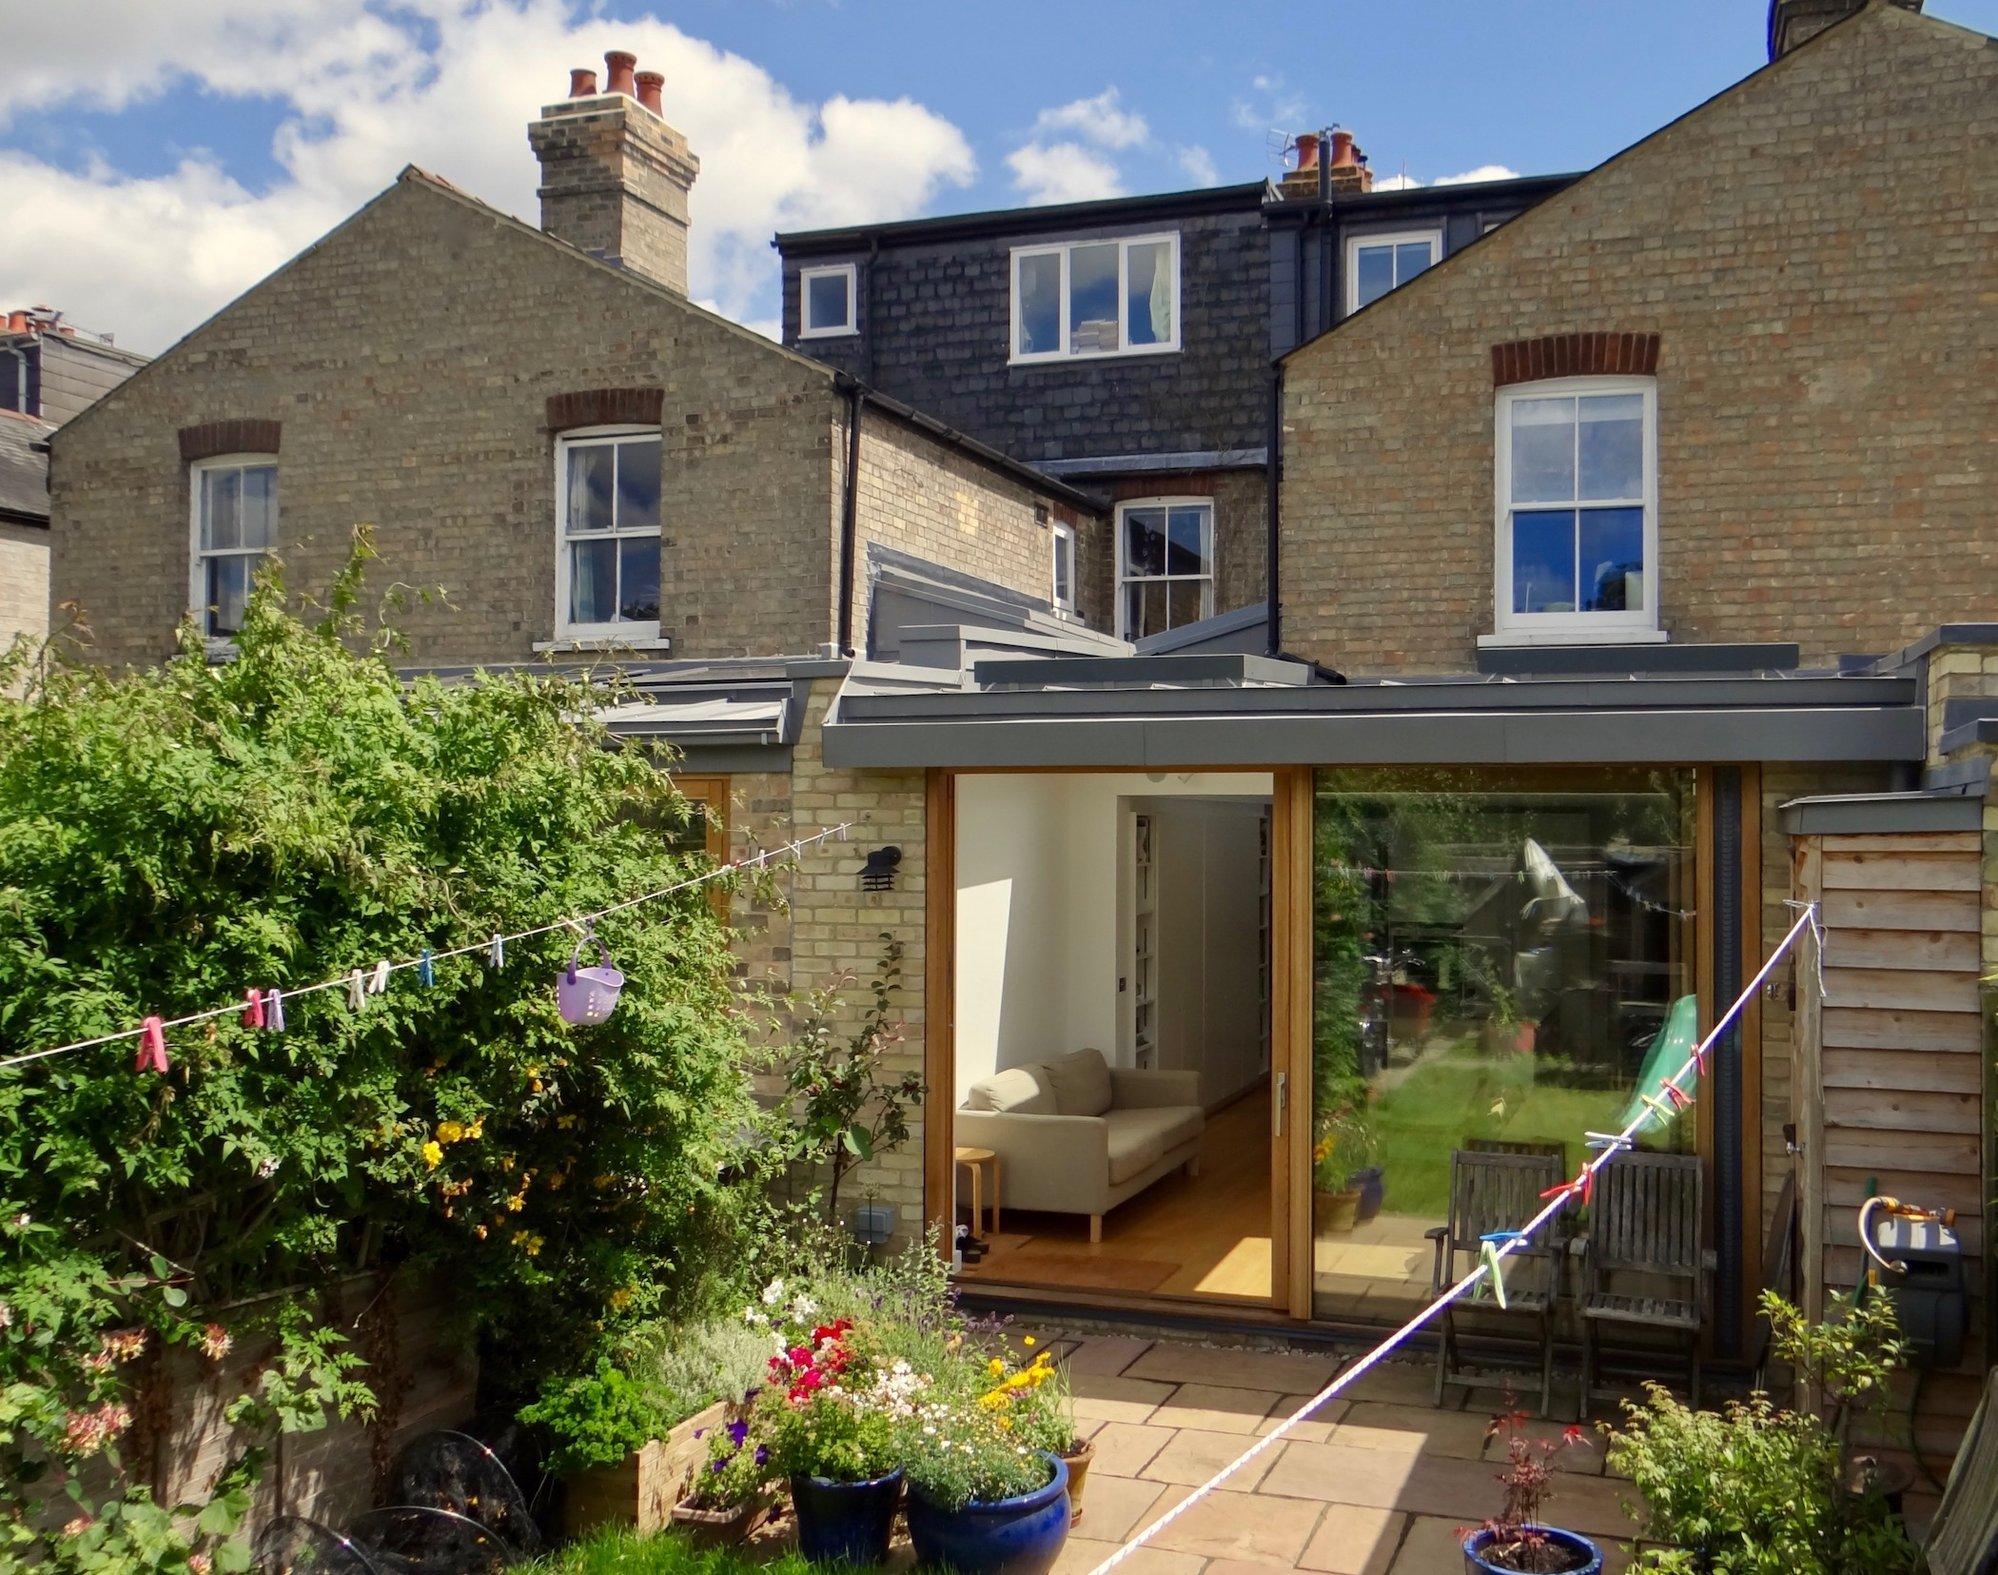 Eltisley Avenue Cambridge, 2 houses 2016-2017